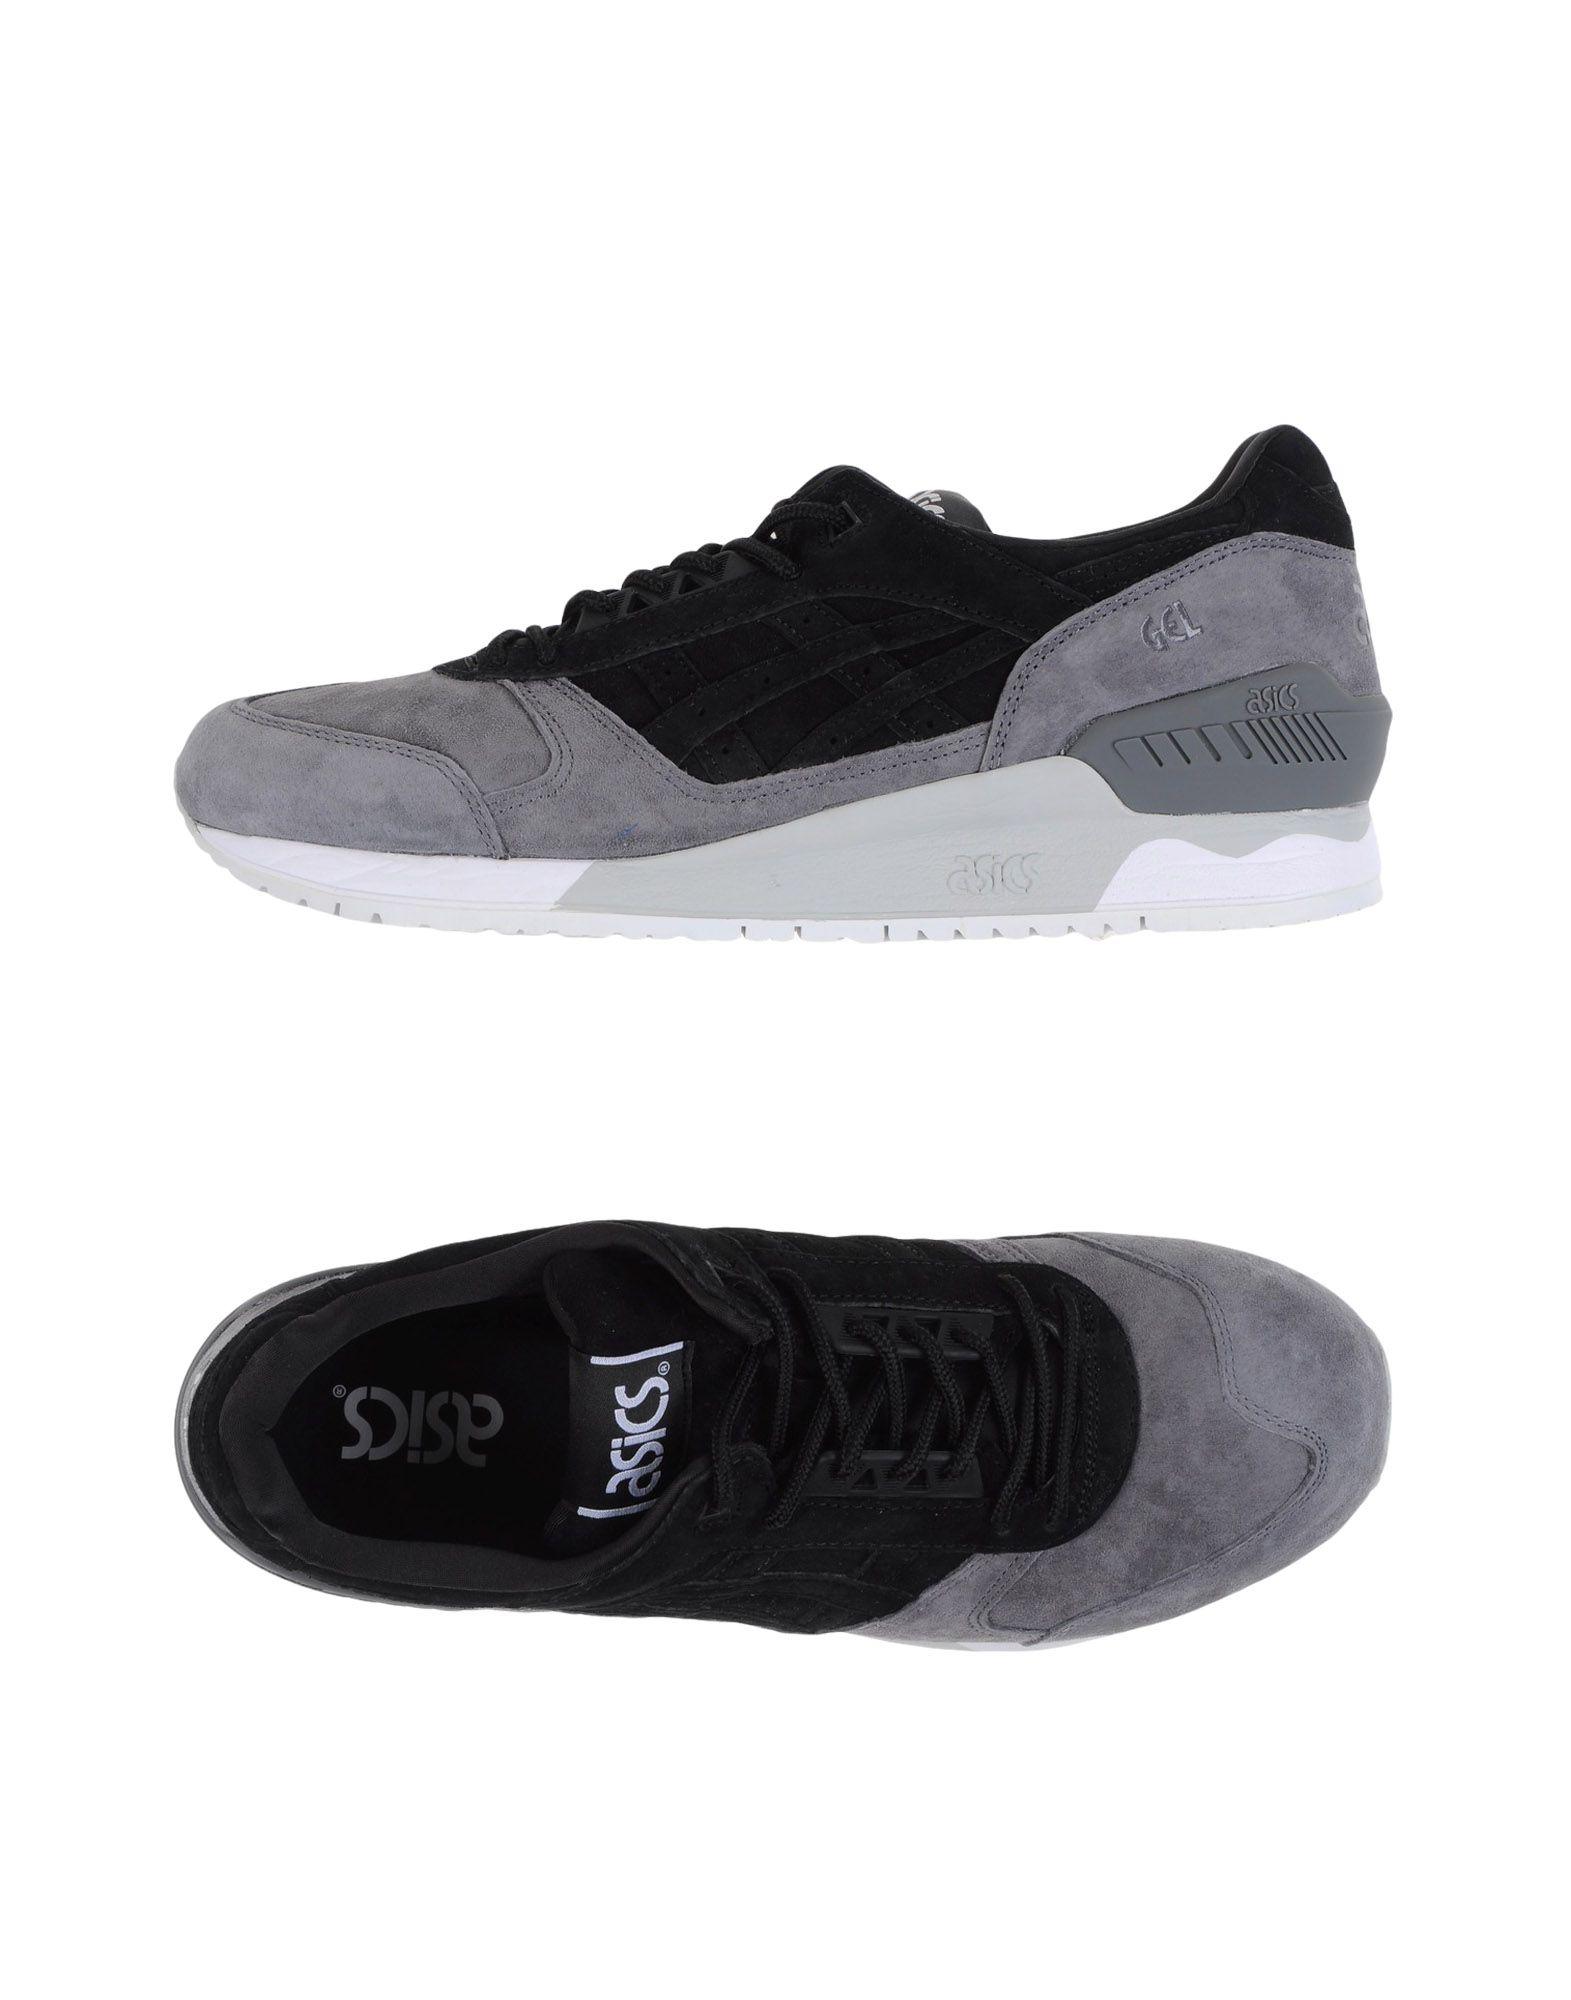 Sneakers Asics Tiger Gel-Respector - Homme - Sneakers Asics Tiger sur